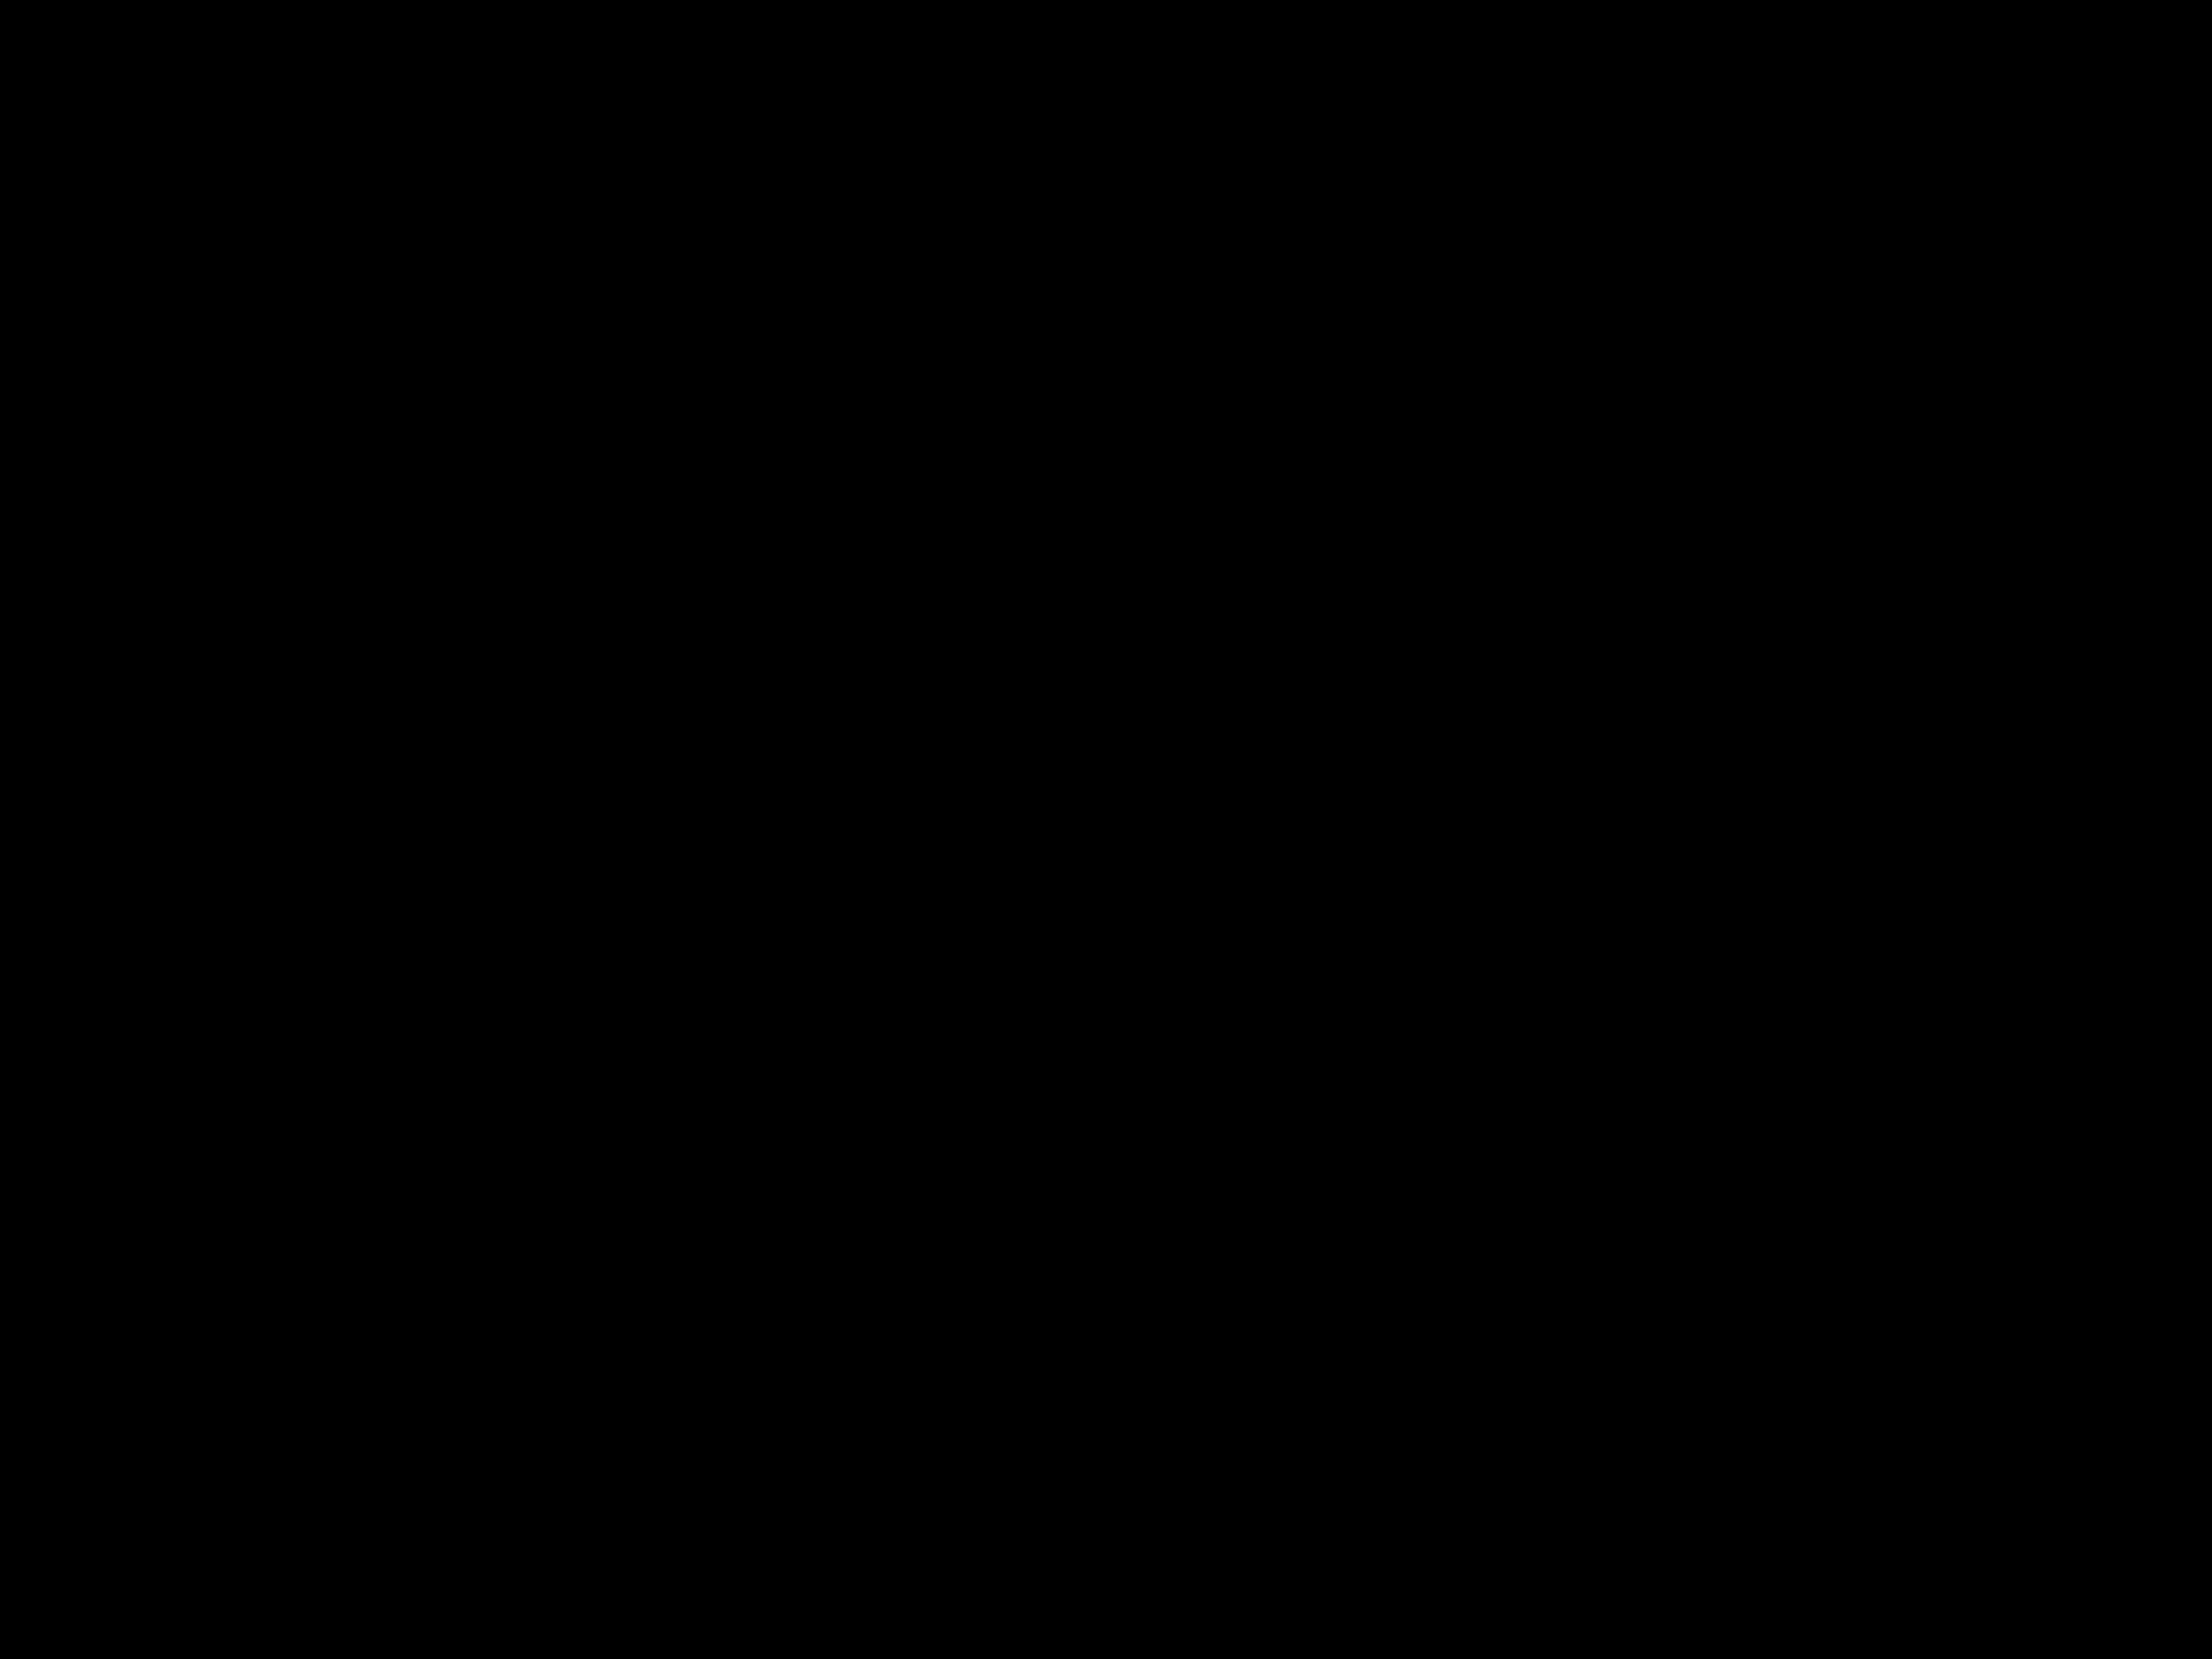 royal opera house logo black